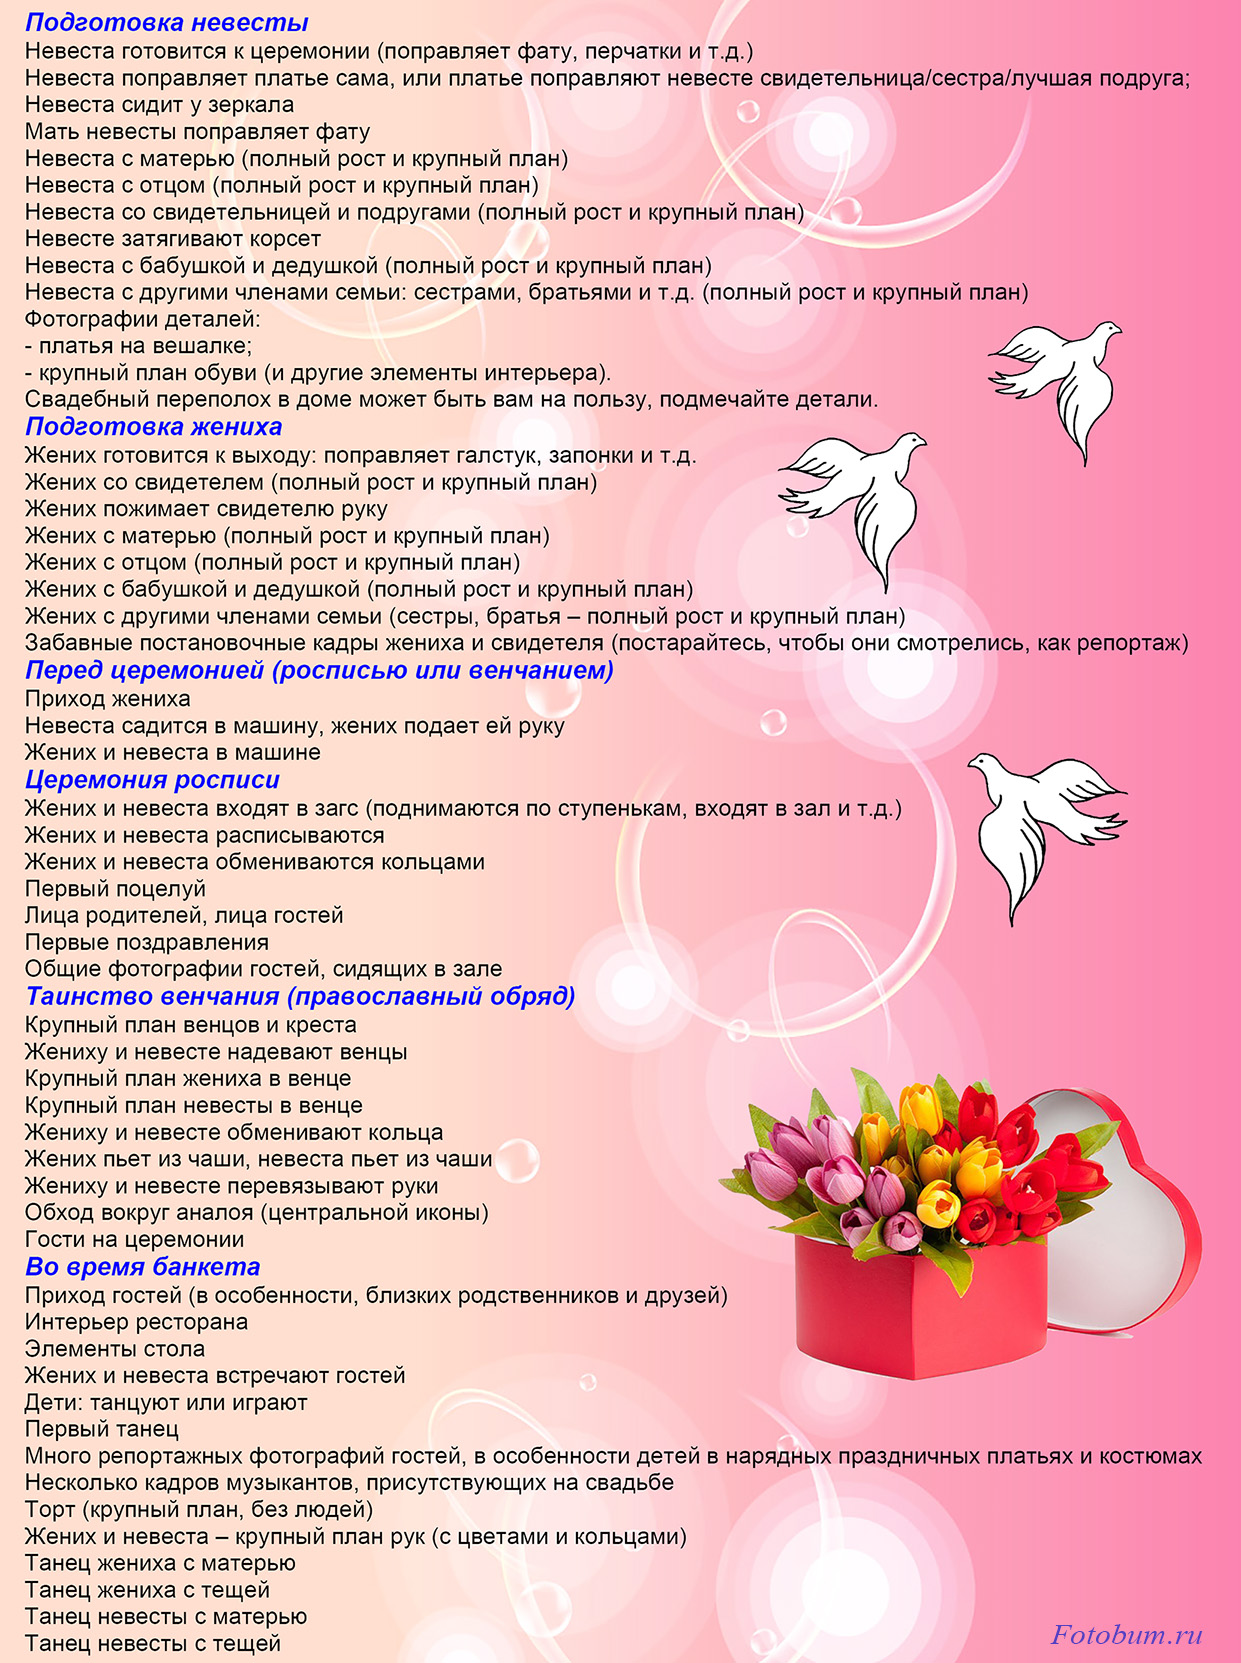 checklist4